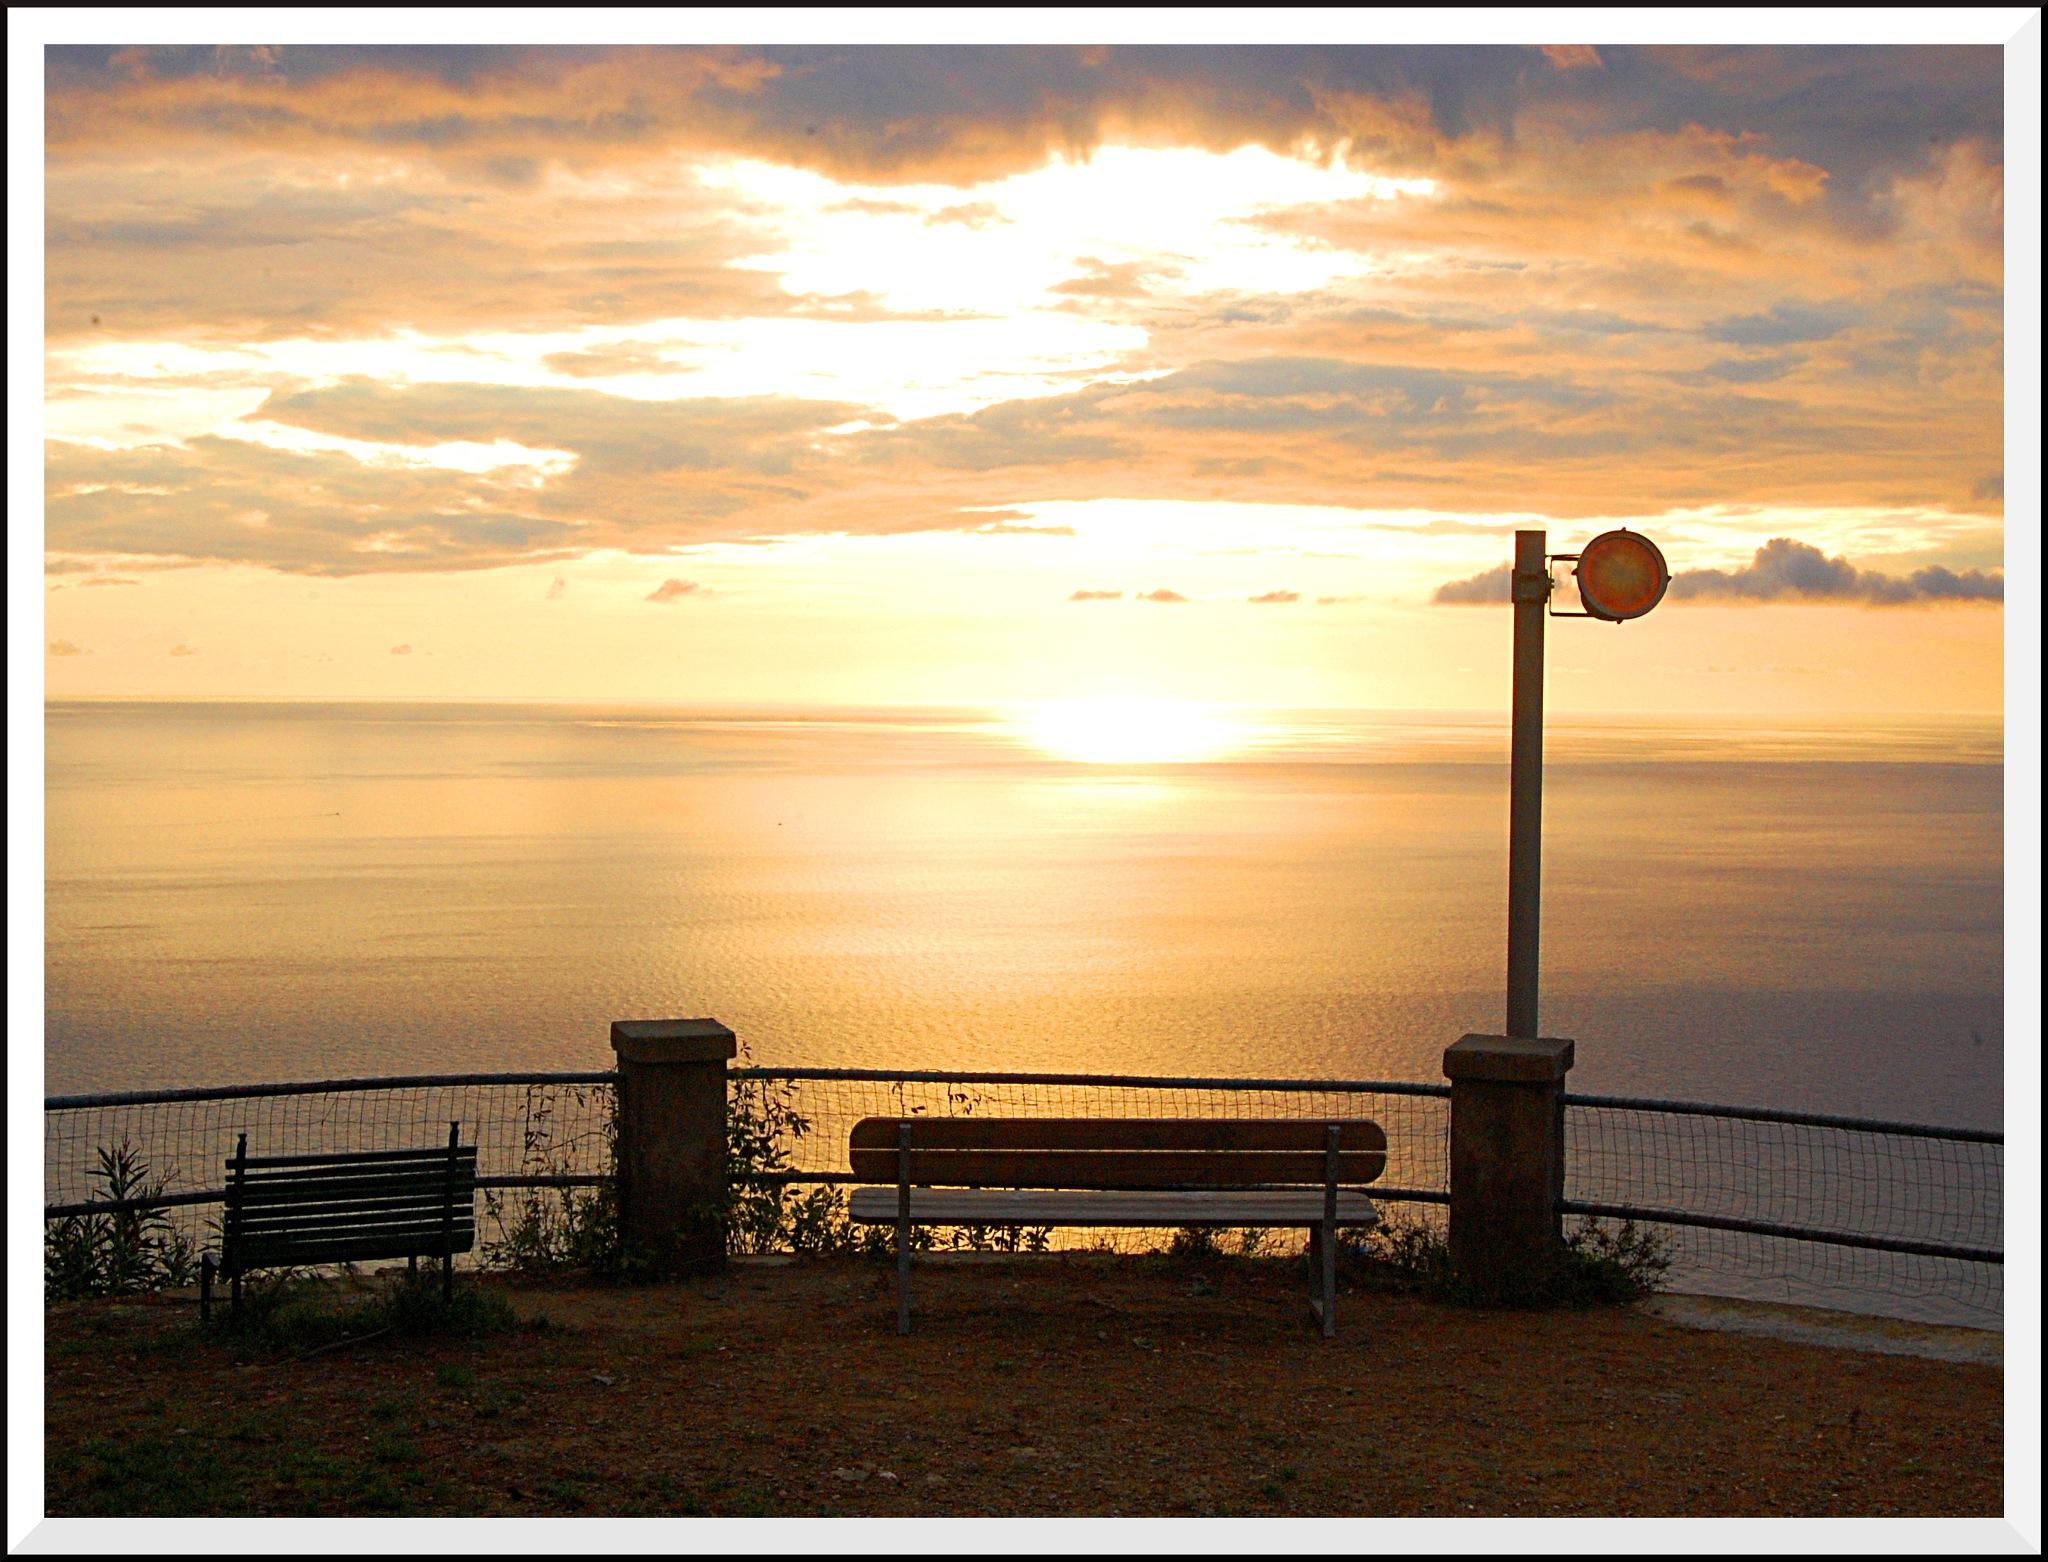 Sunset over ligurian sea by Andrea Macherelli Bianchini